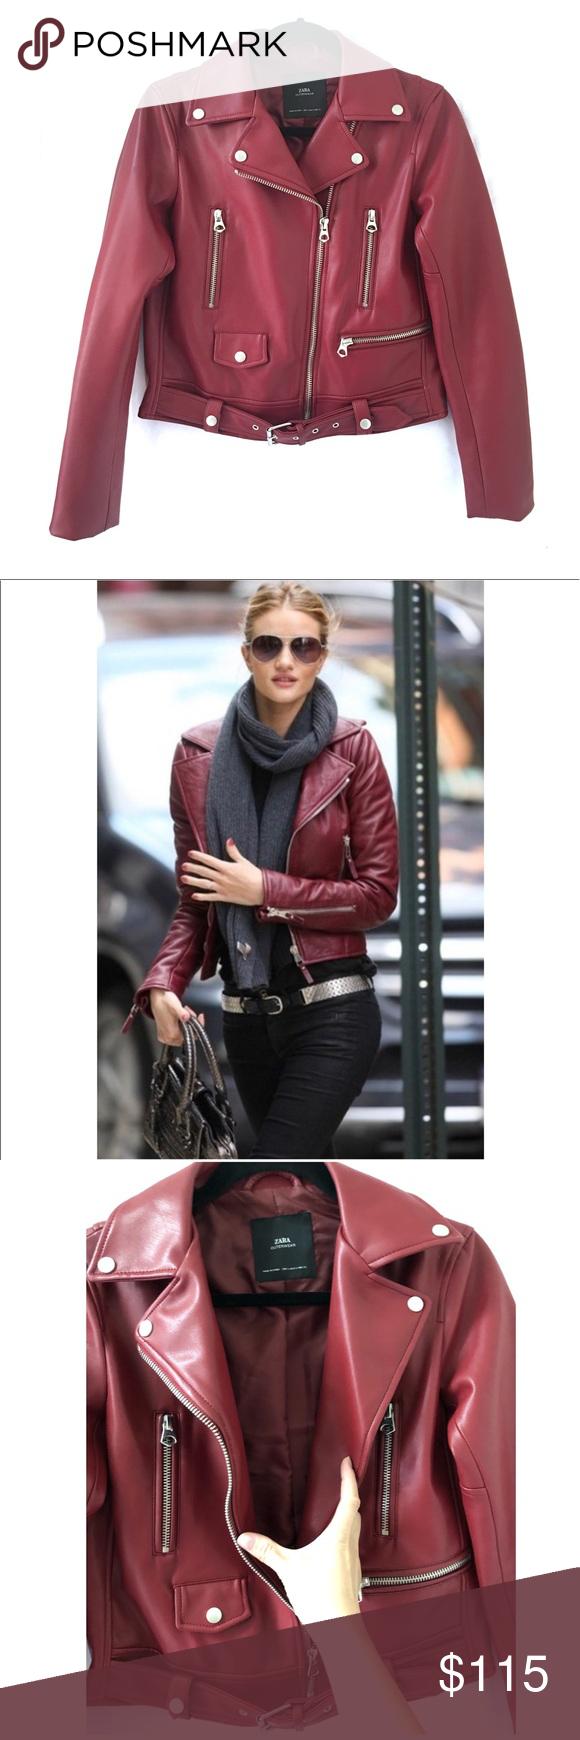 ZARA Faux Leather Moto Jacket Rare Burgundy (With images